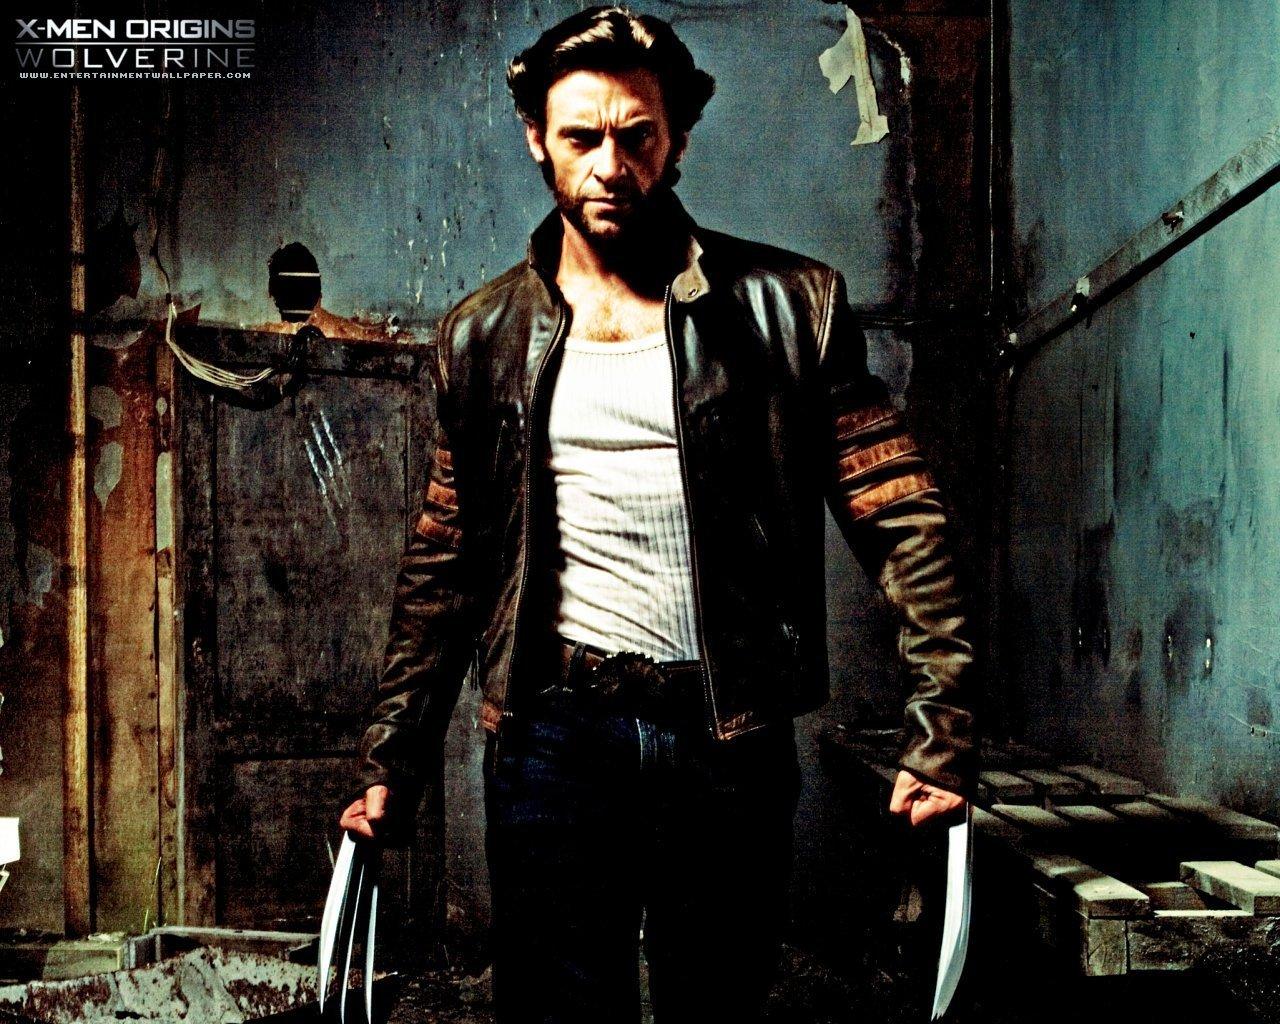 Upcoming Movies images X Men Origins Wolverine Wallpaper 1280x1024